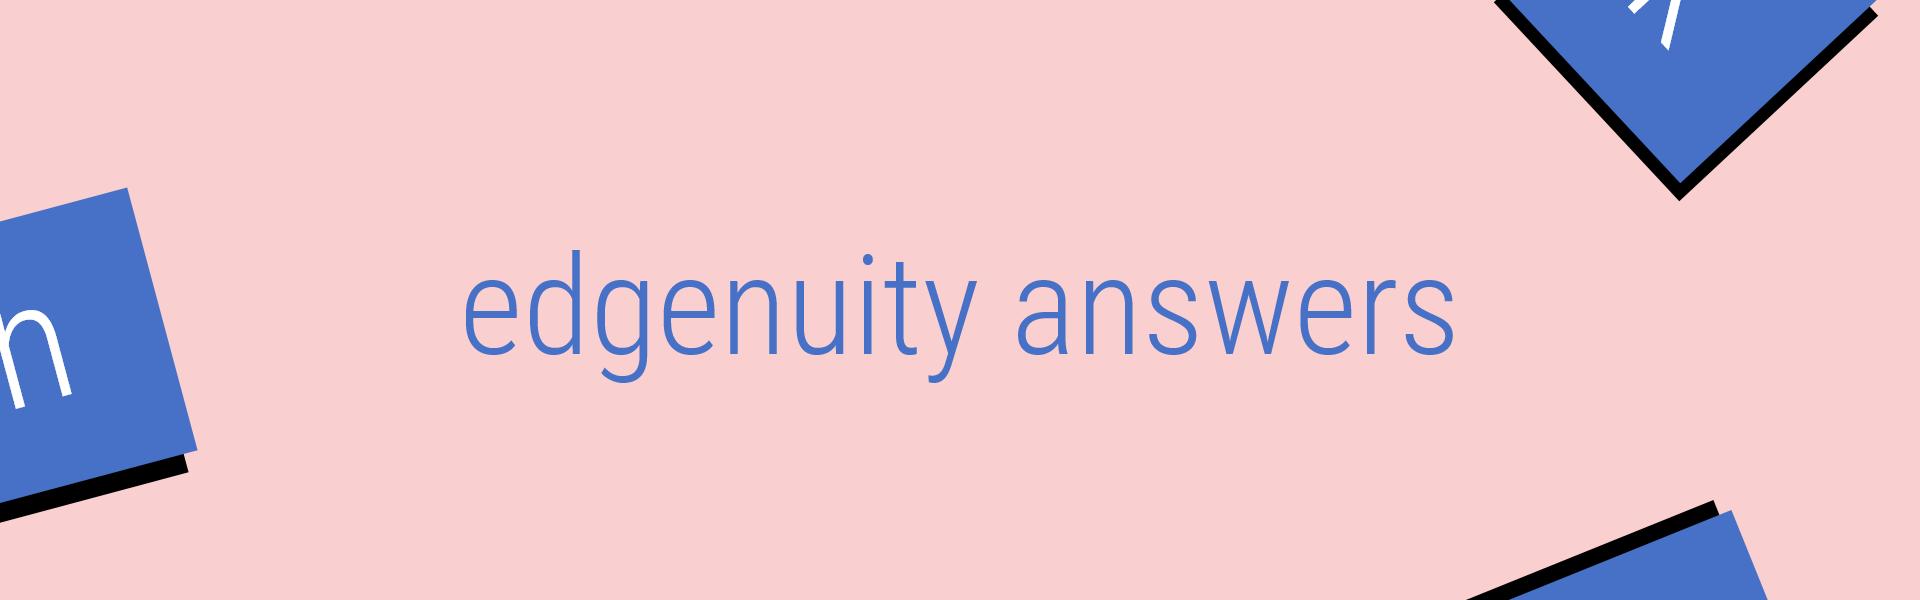 edgenuity answers